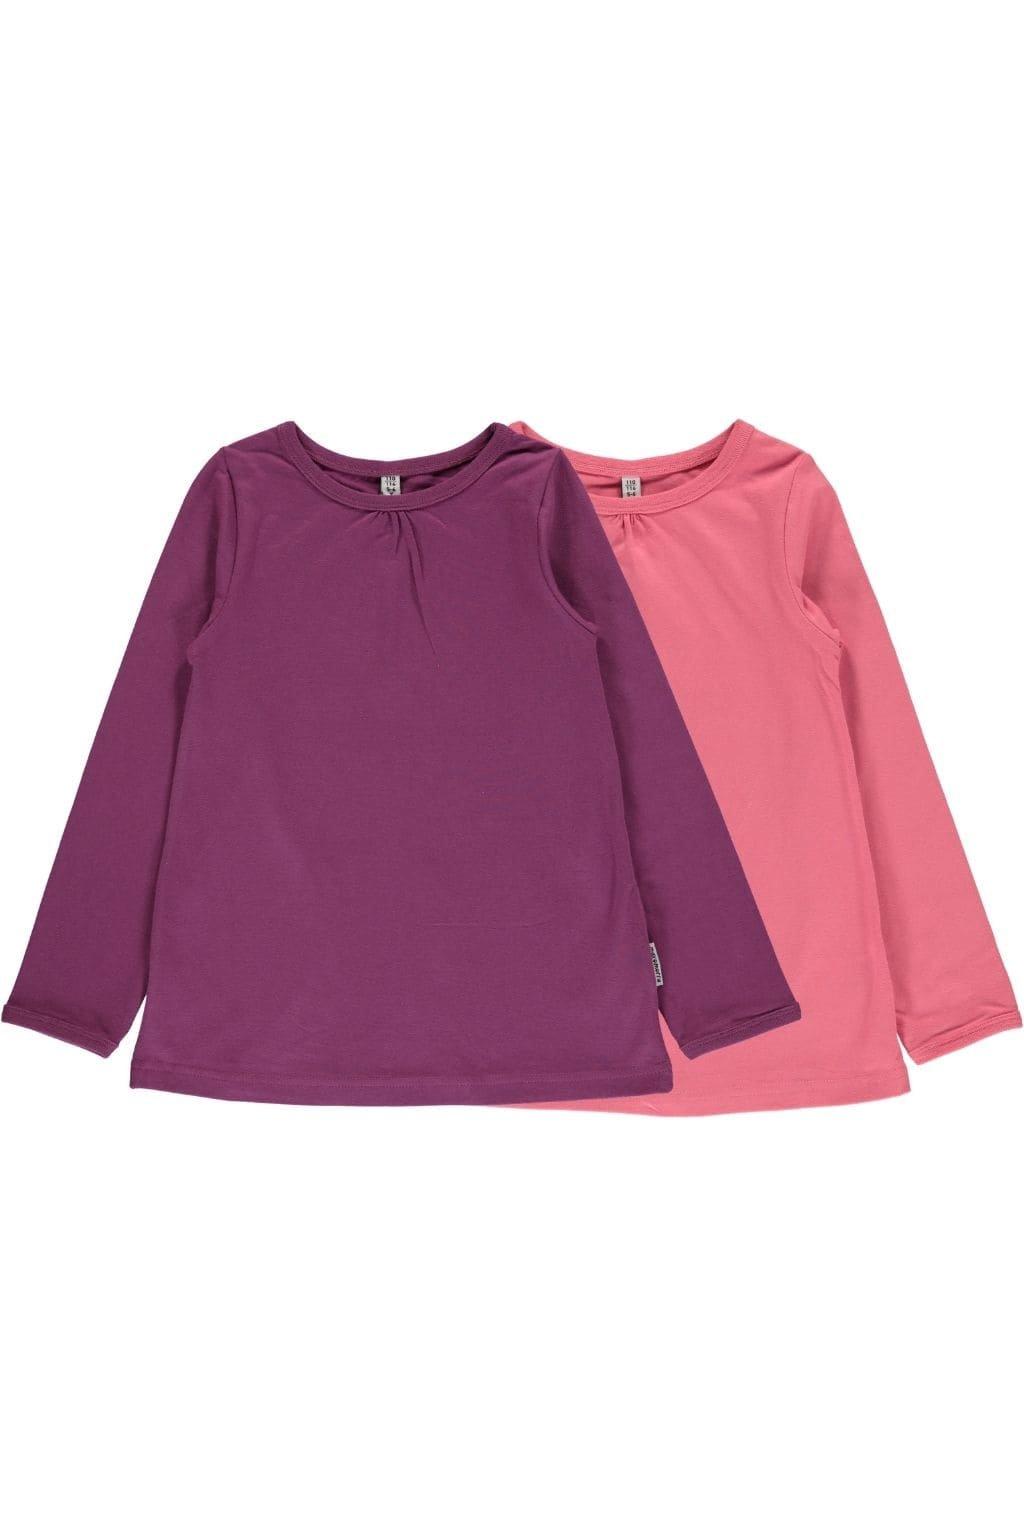 girl top ls rose pink + purple (1)